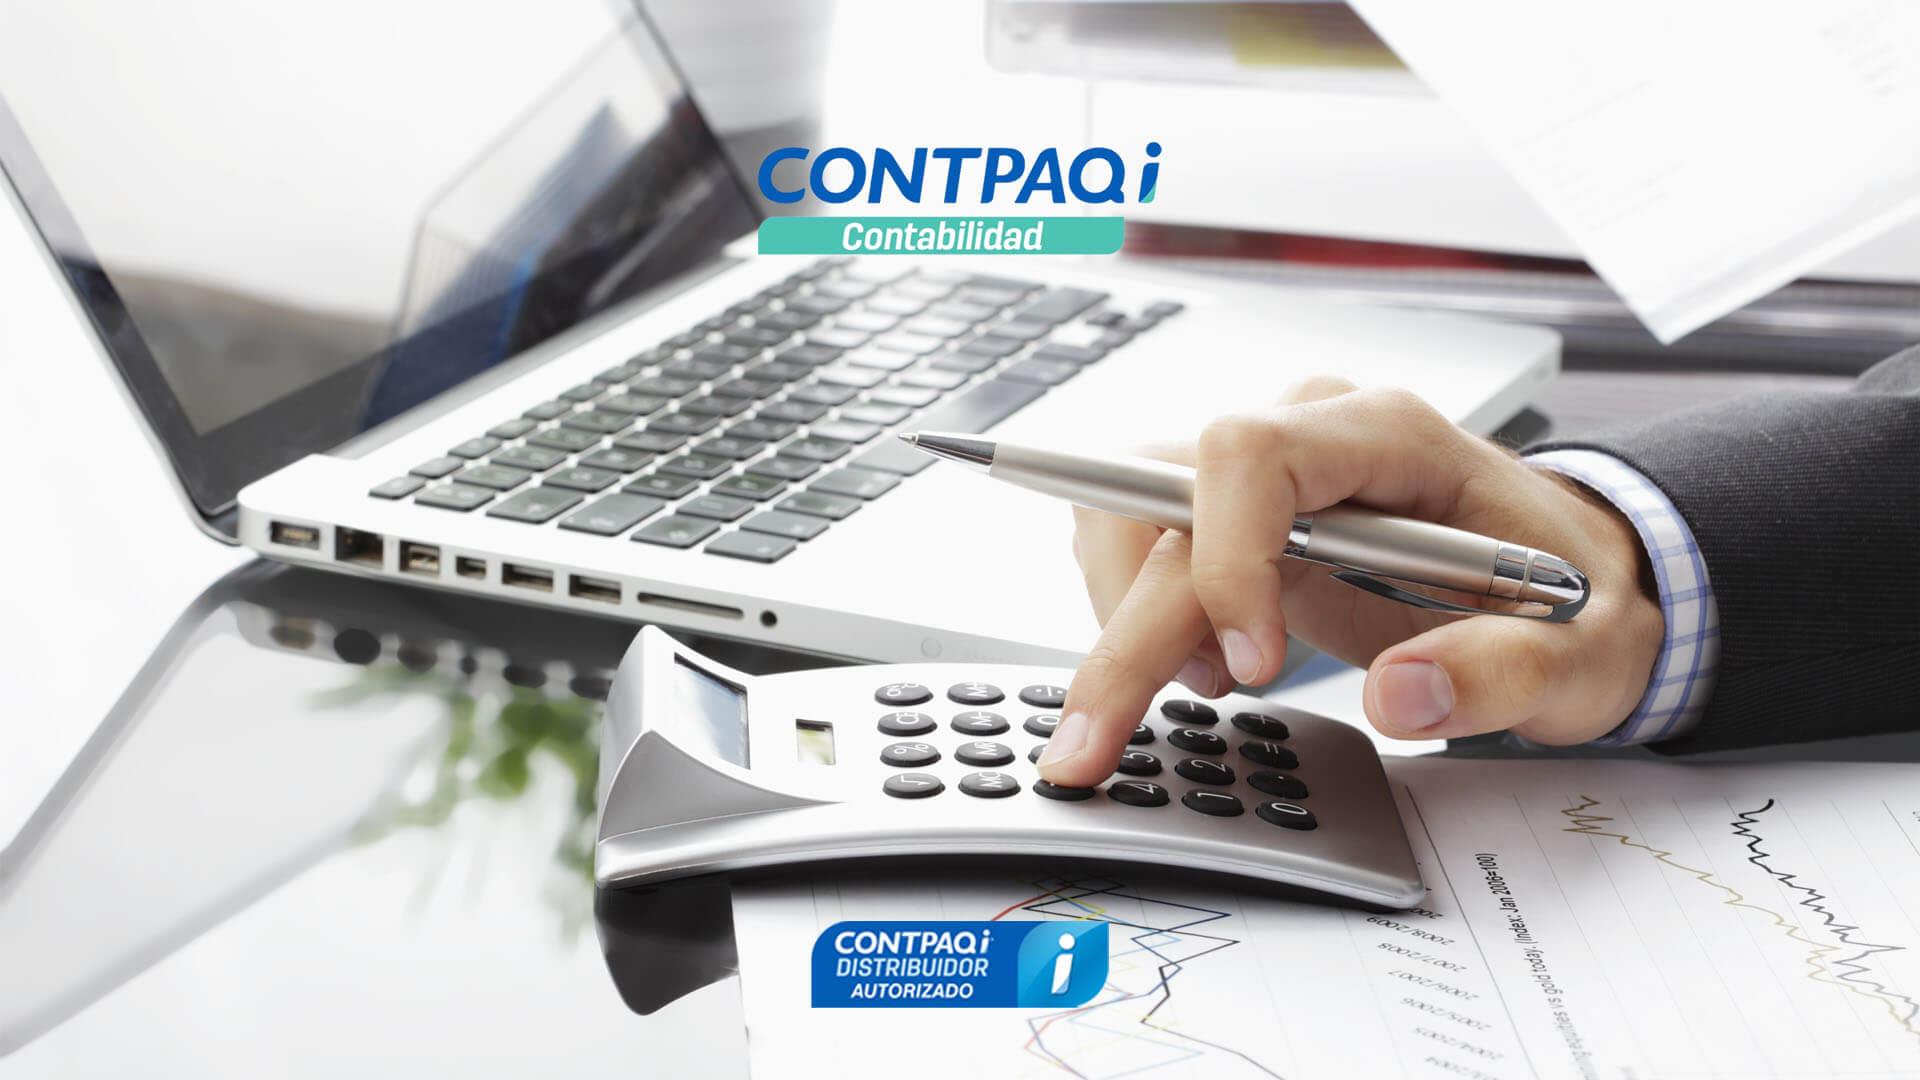 Contpaqi Contabilidad Distribuidor Autorizado, Baja California, México